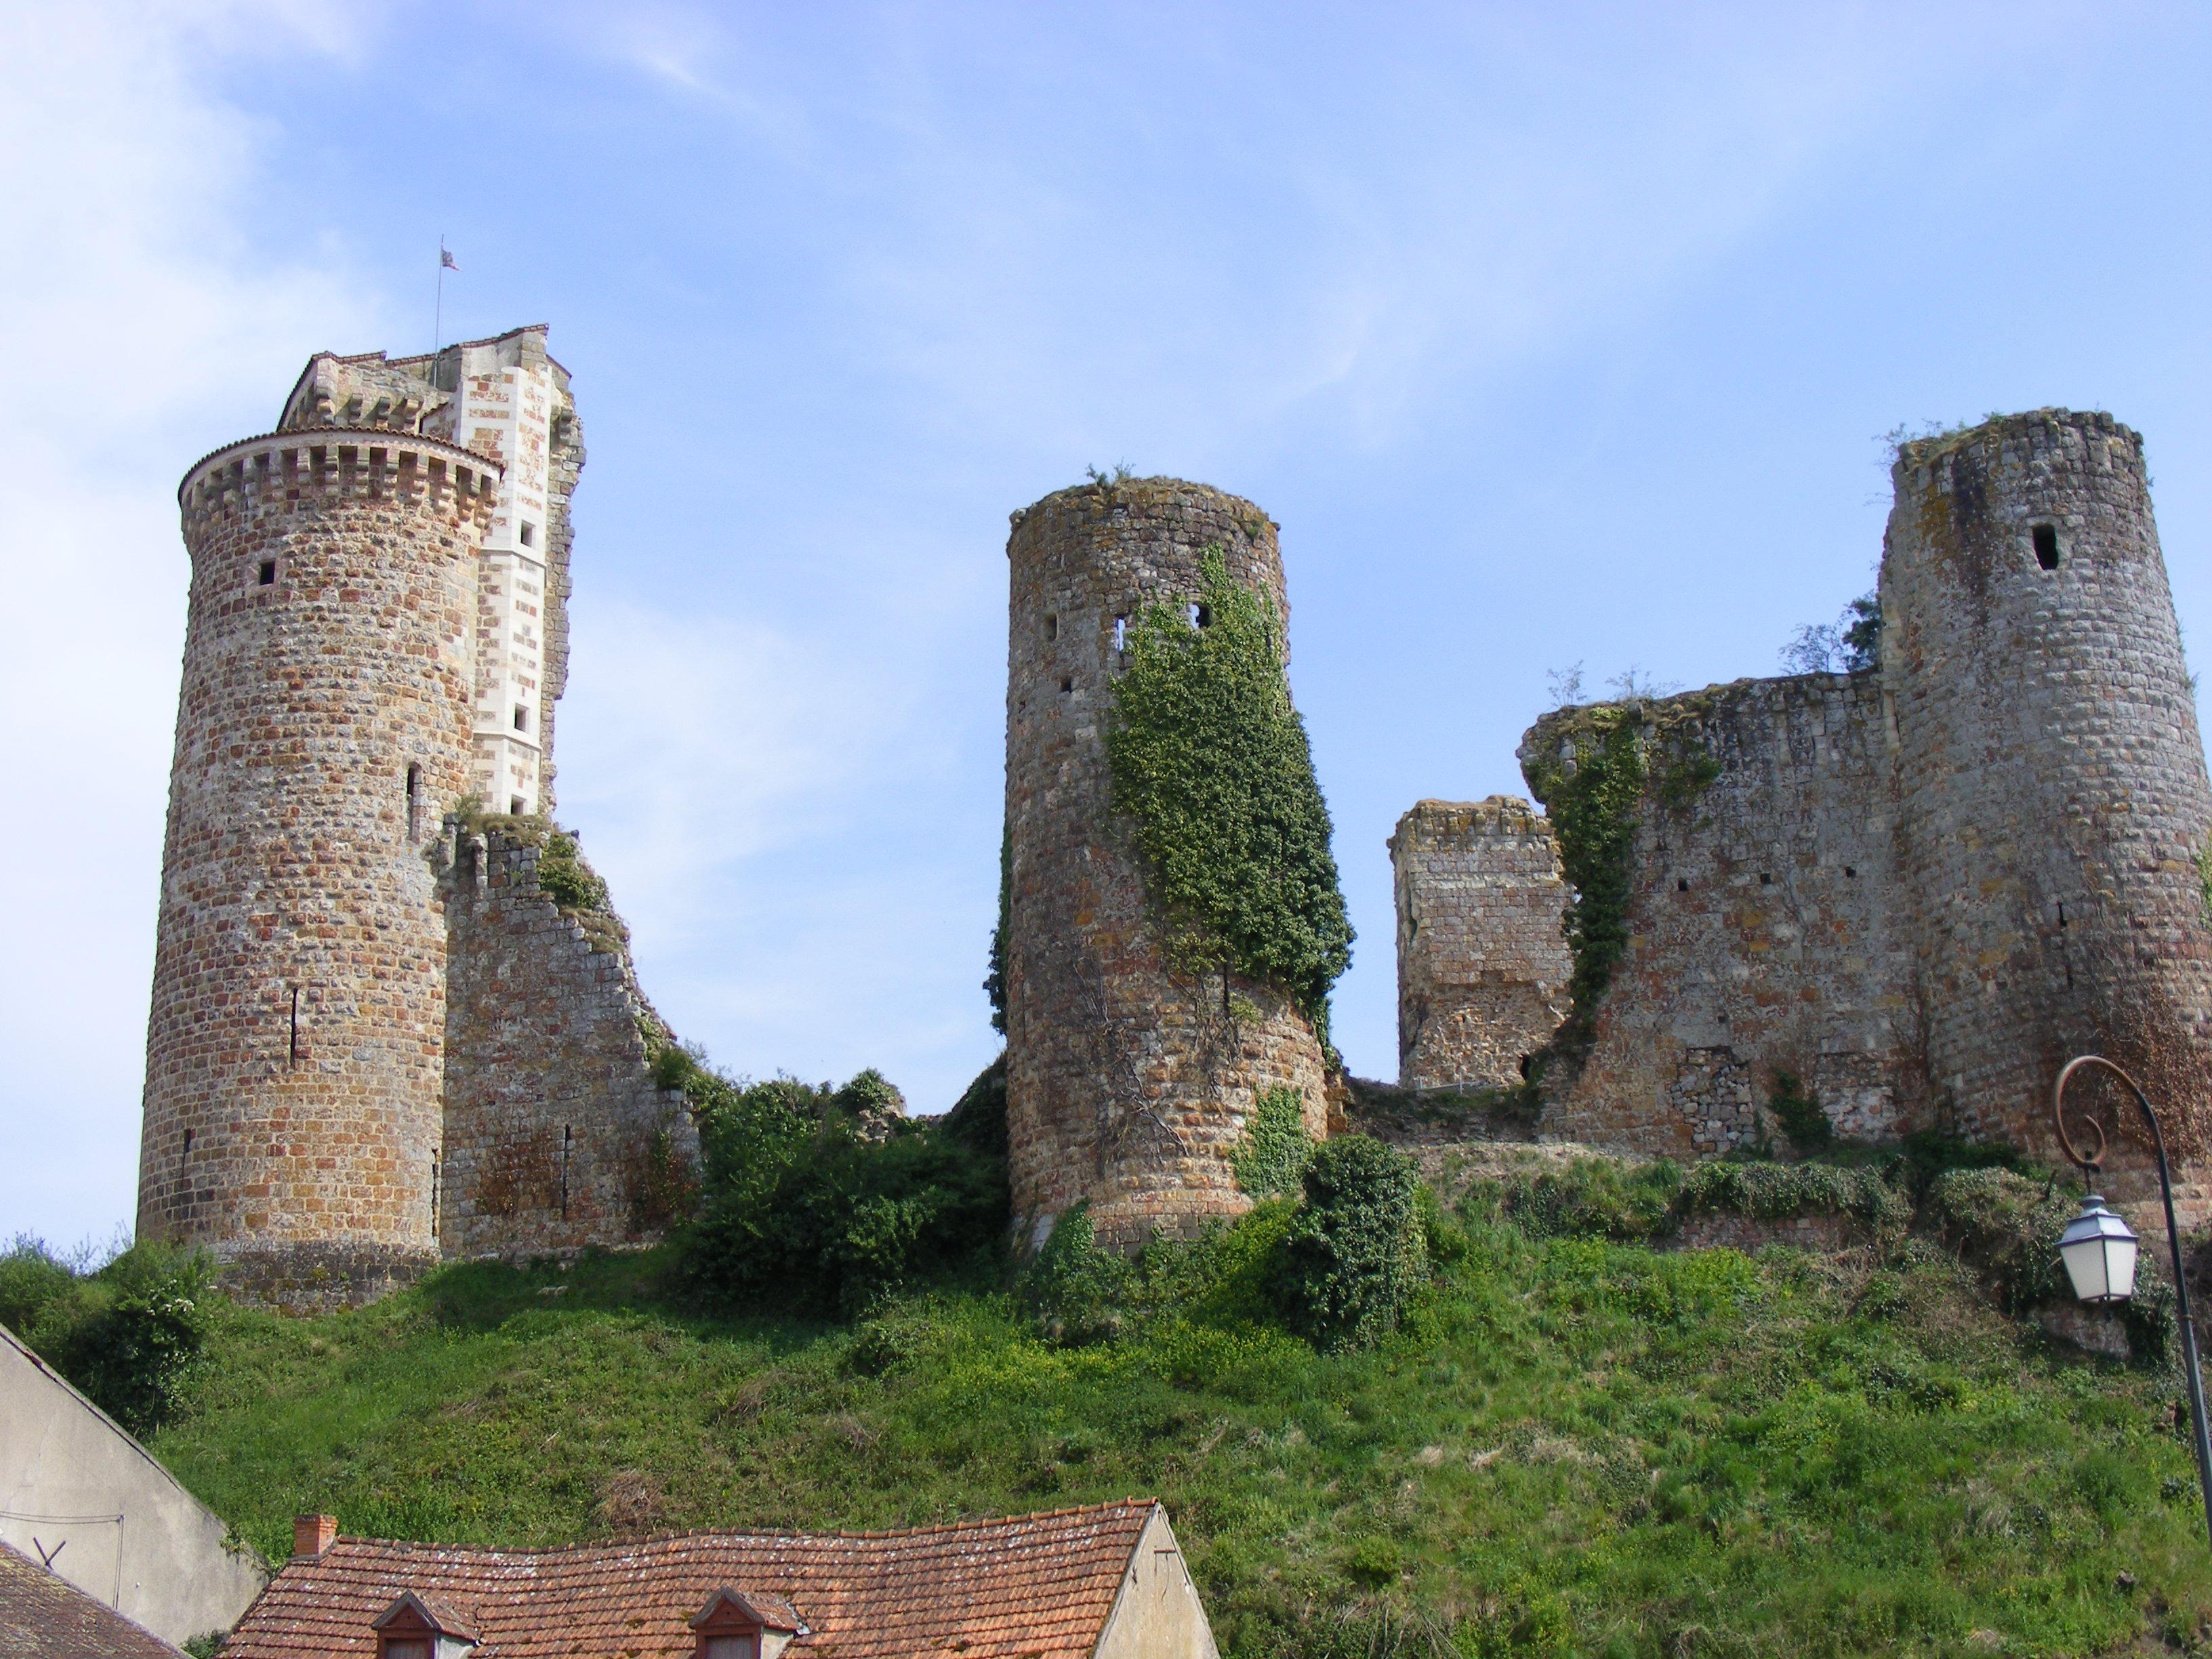 309-chateau-herisson-allier.jpg